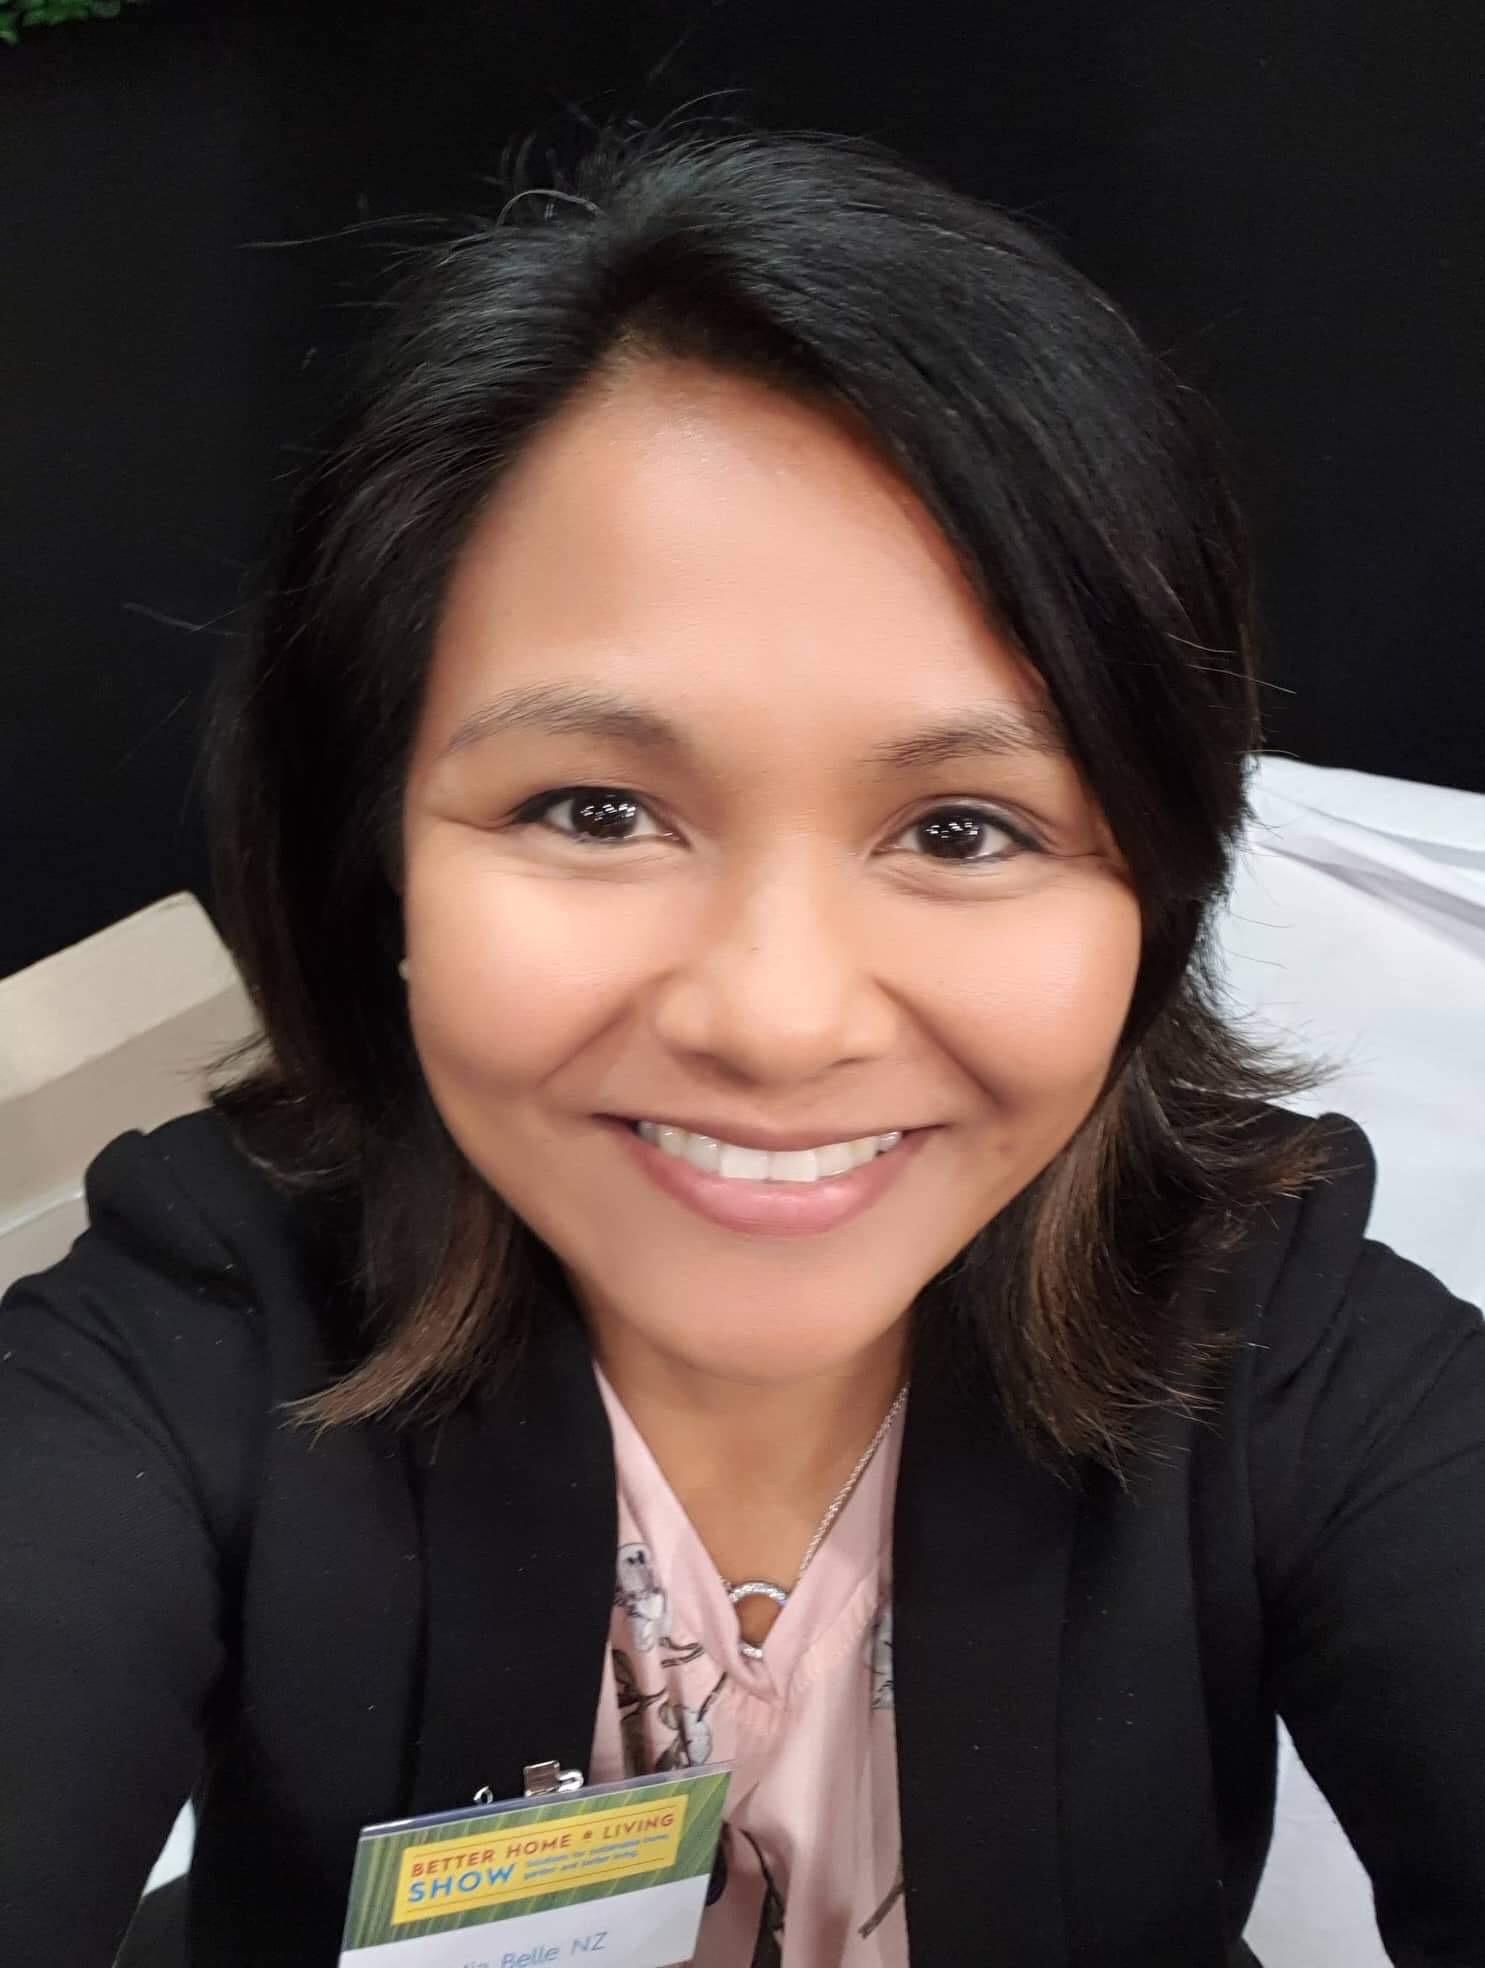 Catherine Sanvictores, CEO, Mia Belle